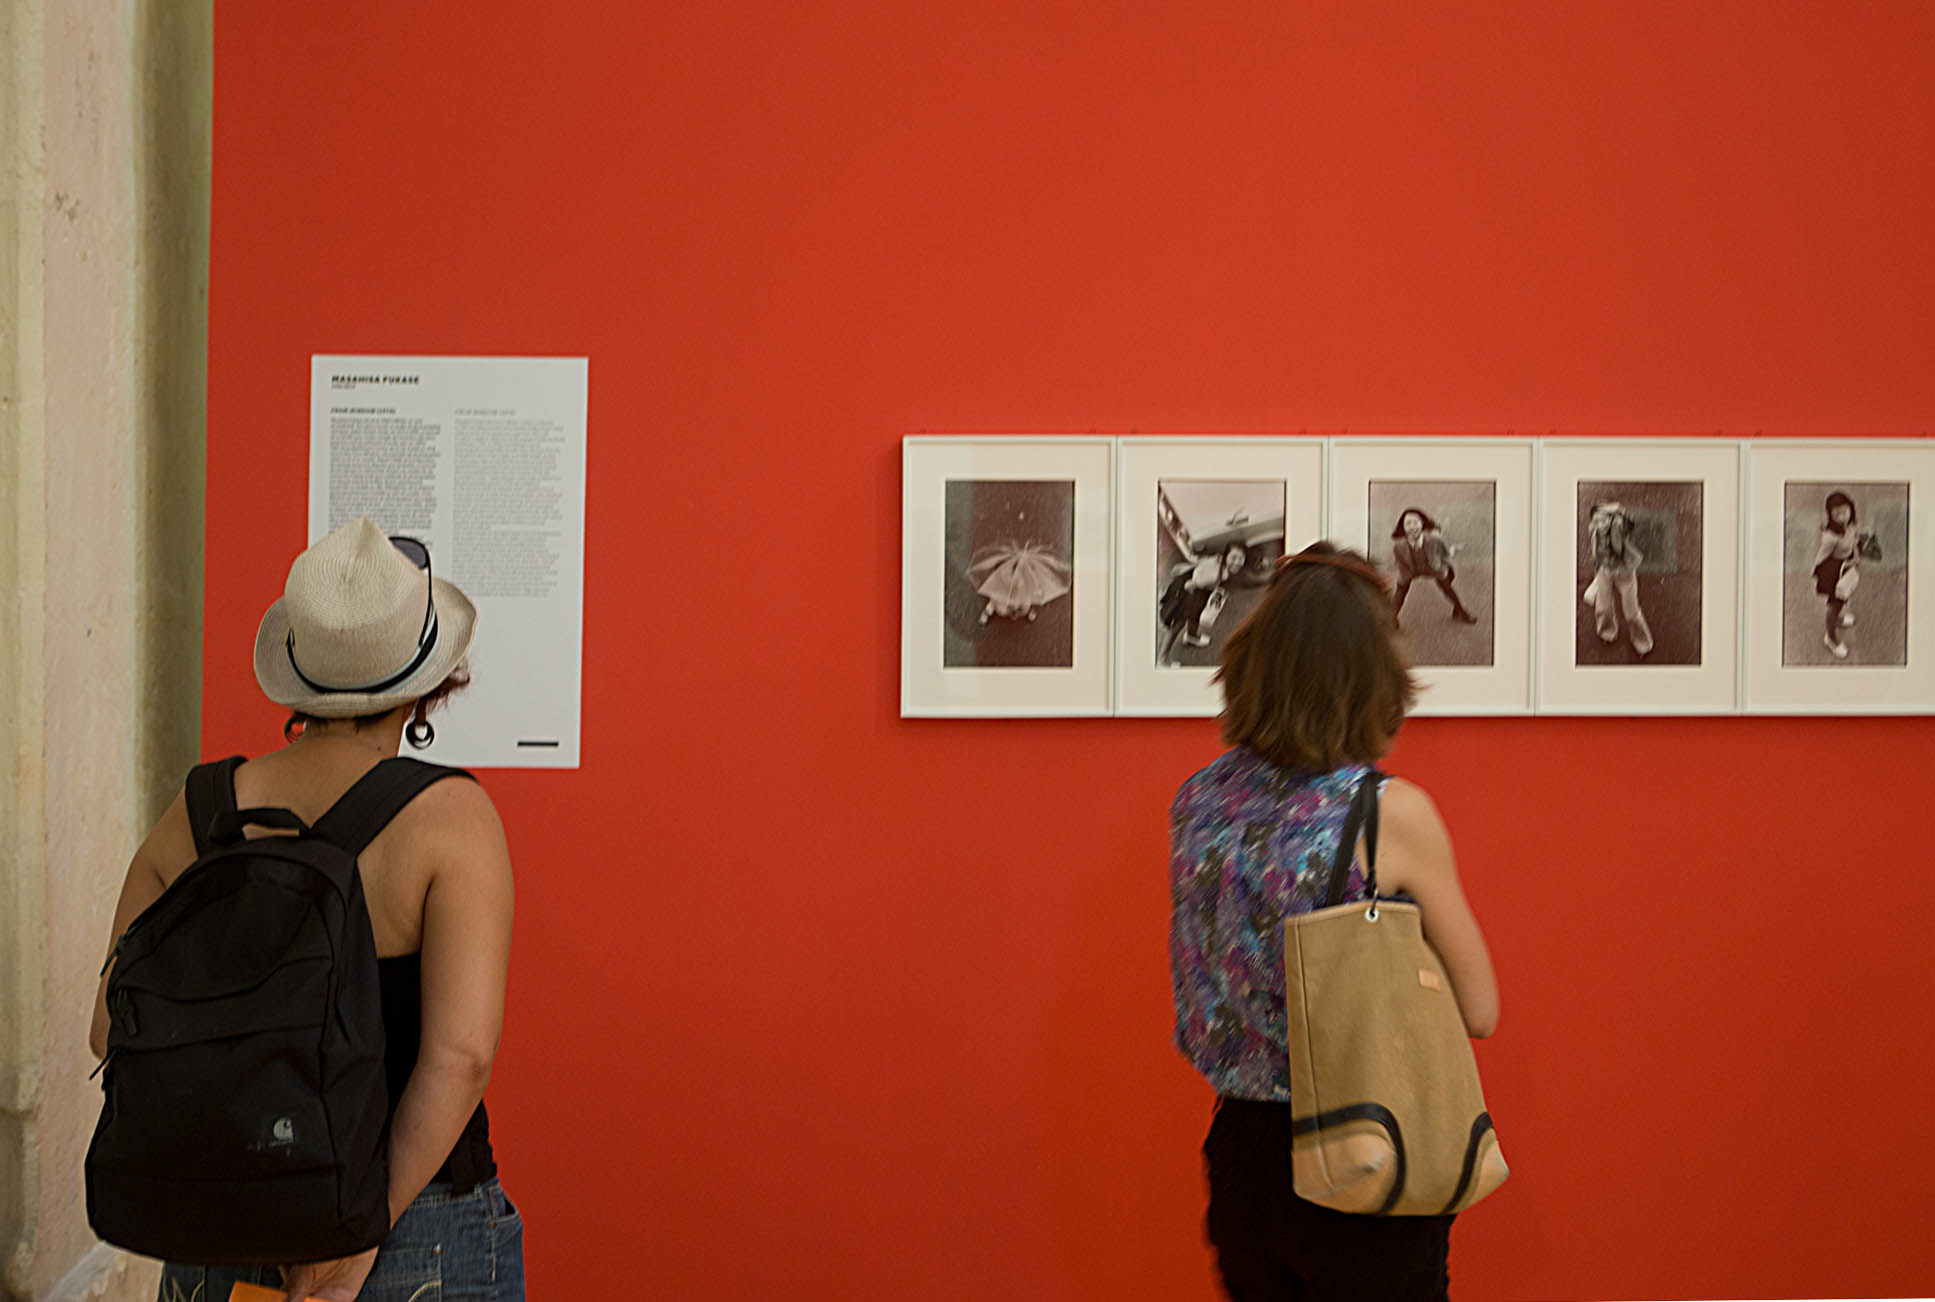 rencontre internationale de la photographie arles termonde